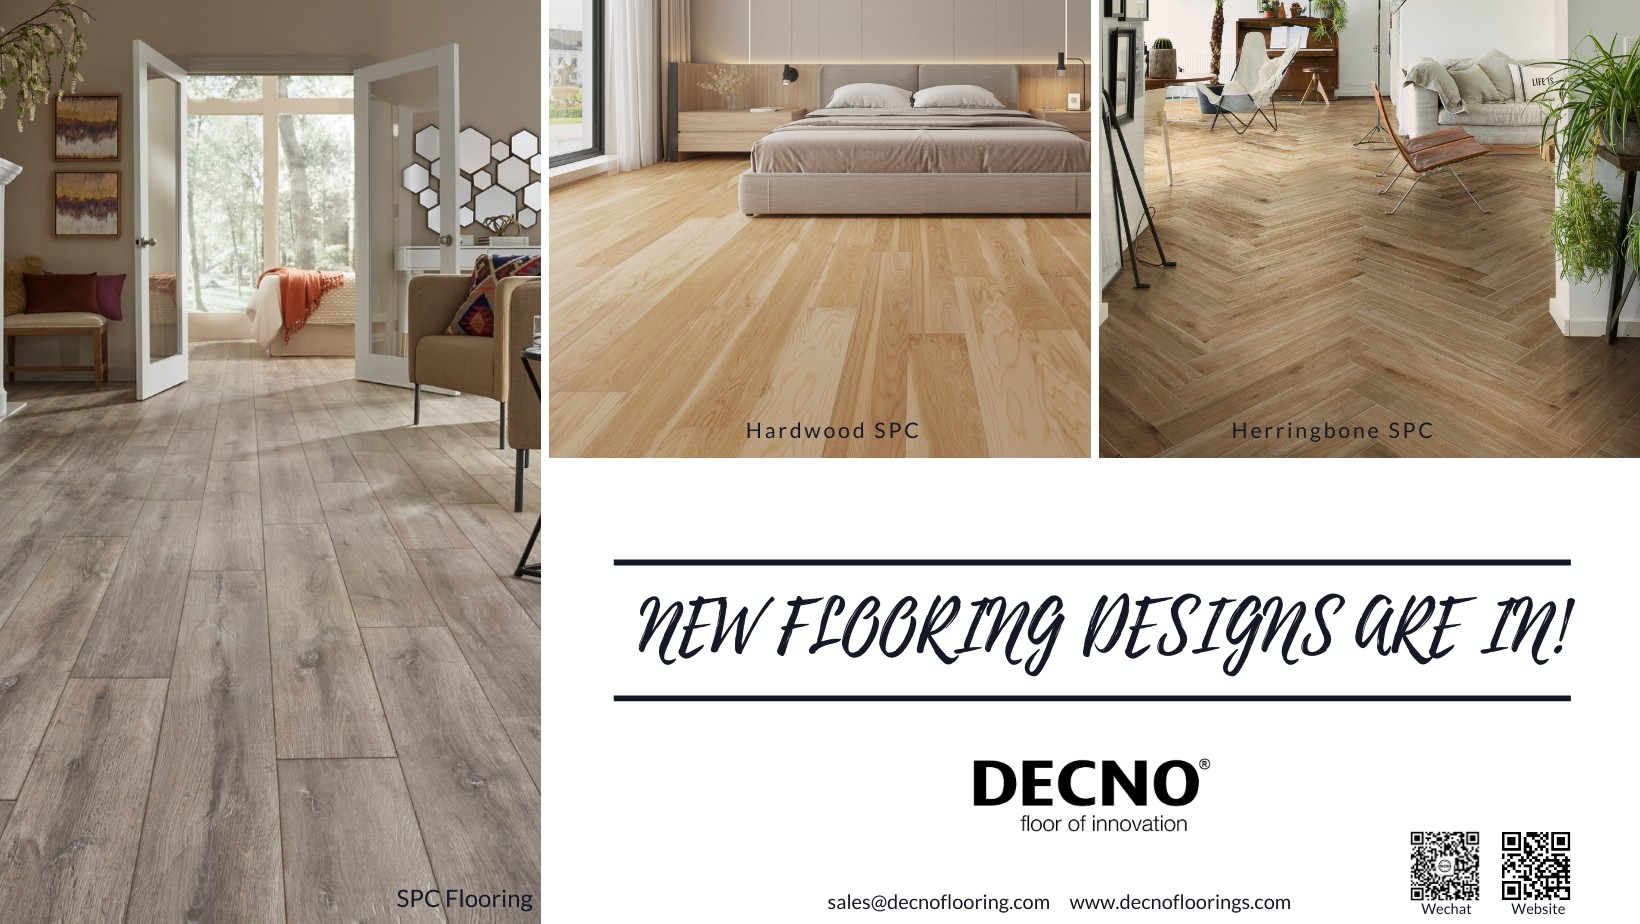 Decno Group China Manufacturer Of High, Laminate Flooring Company